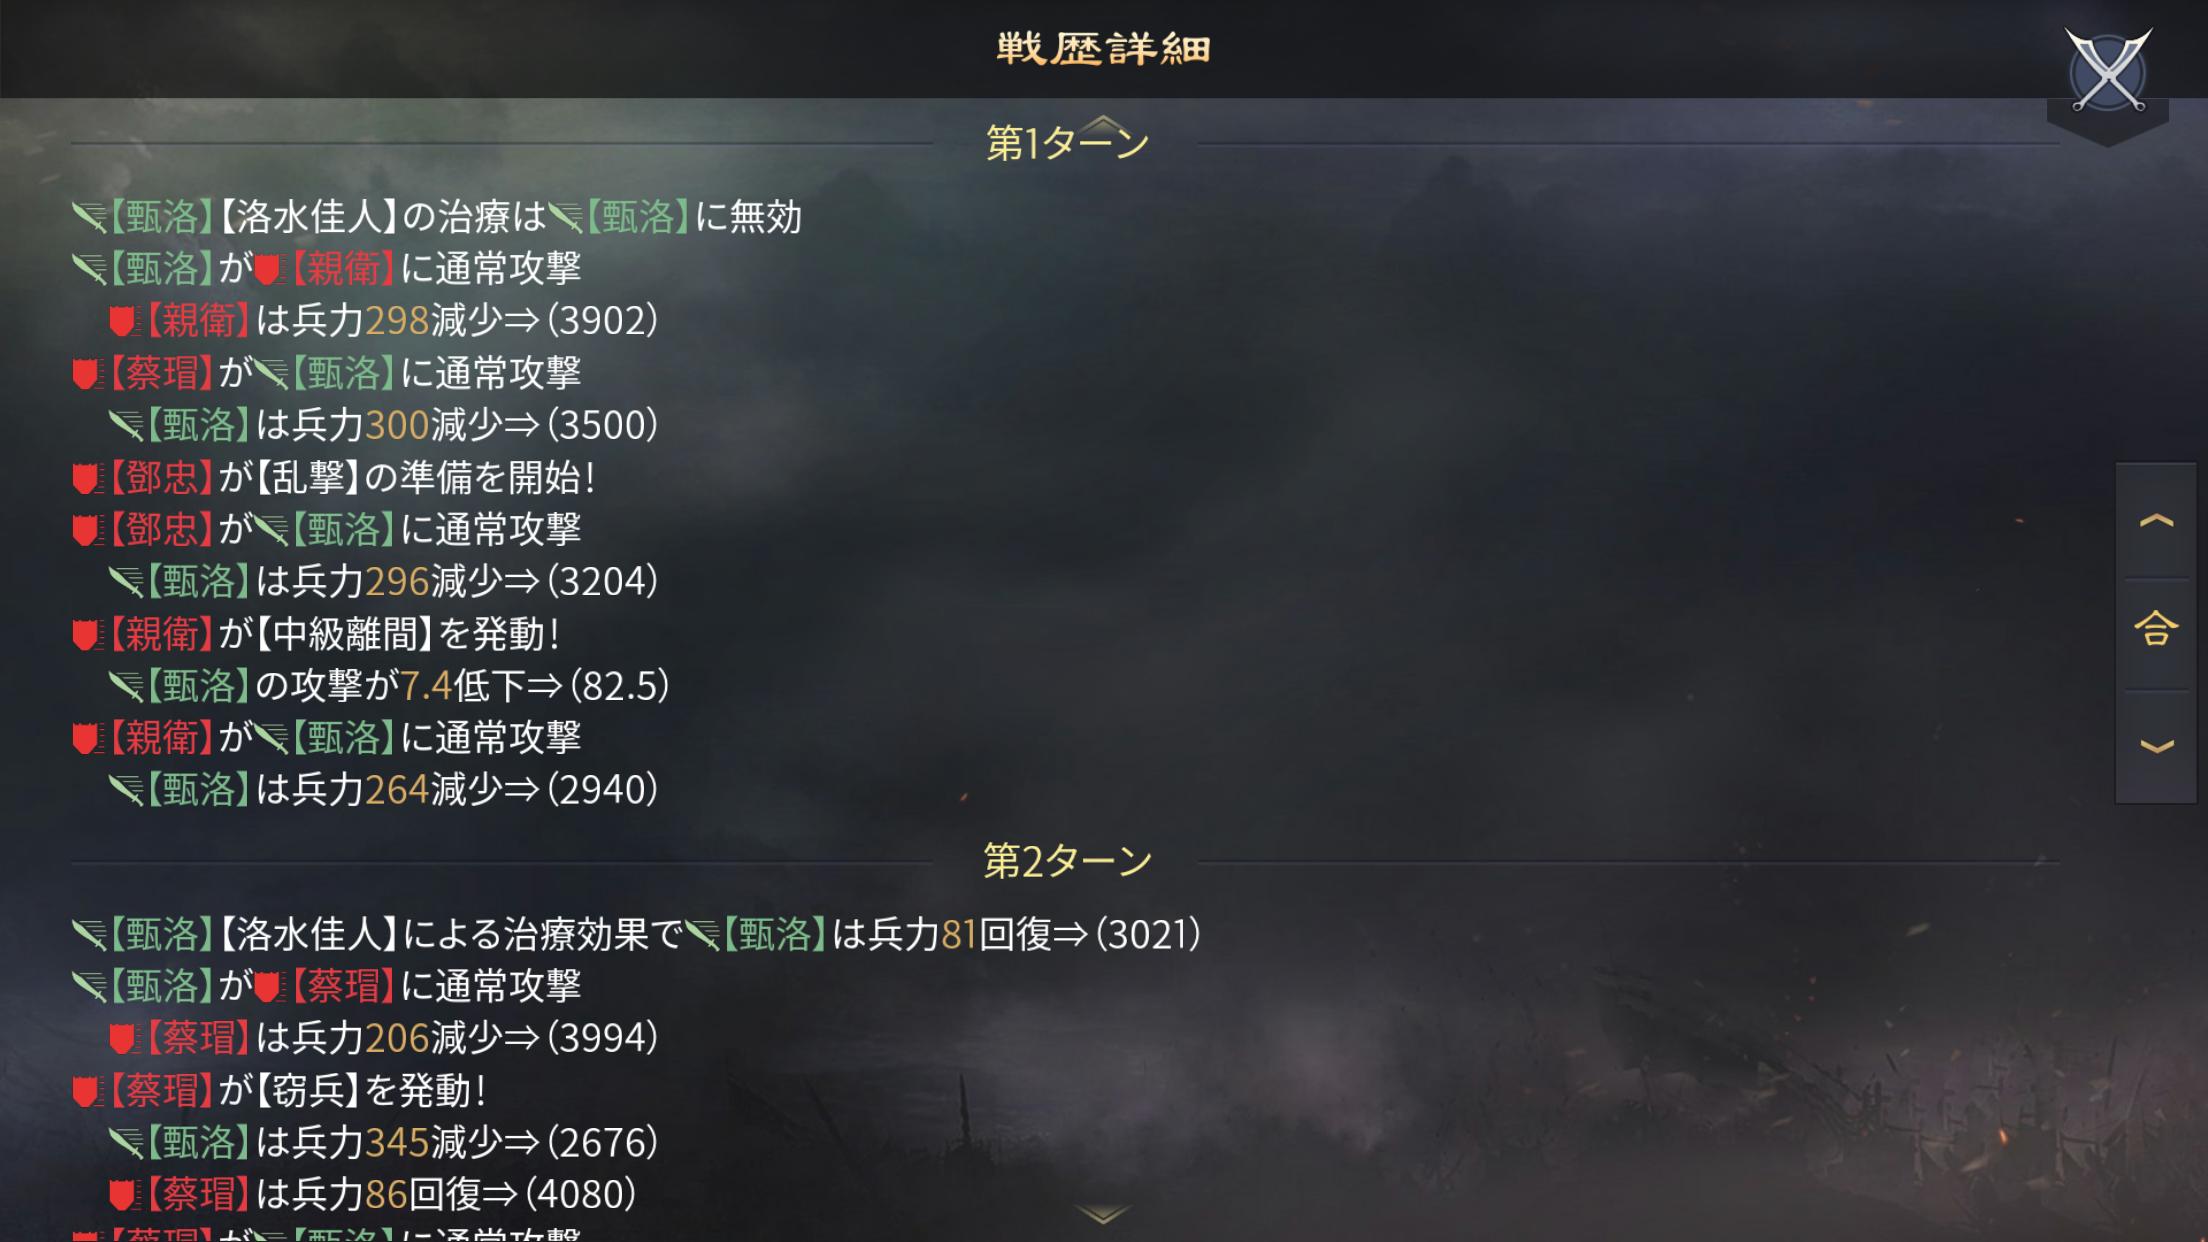 f:id:daisangokushimomimomi:20200327181113p:image